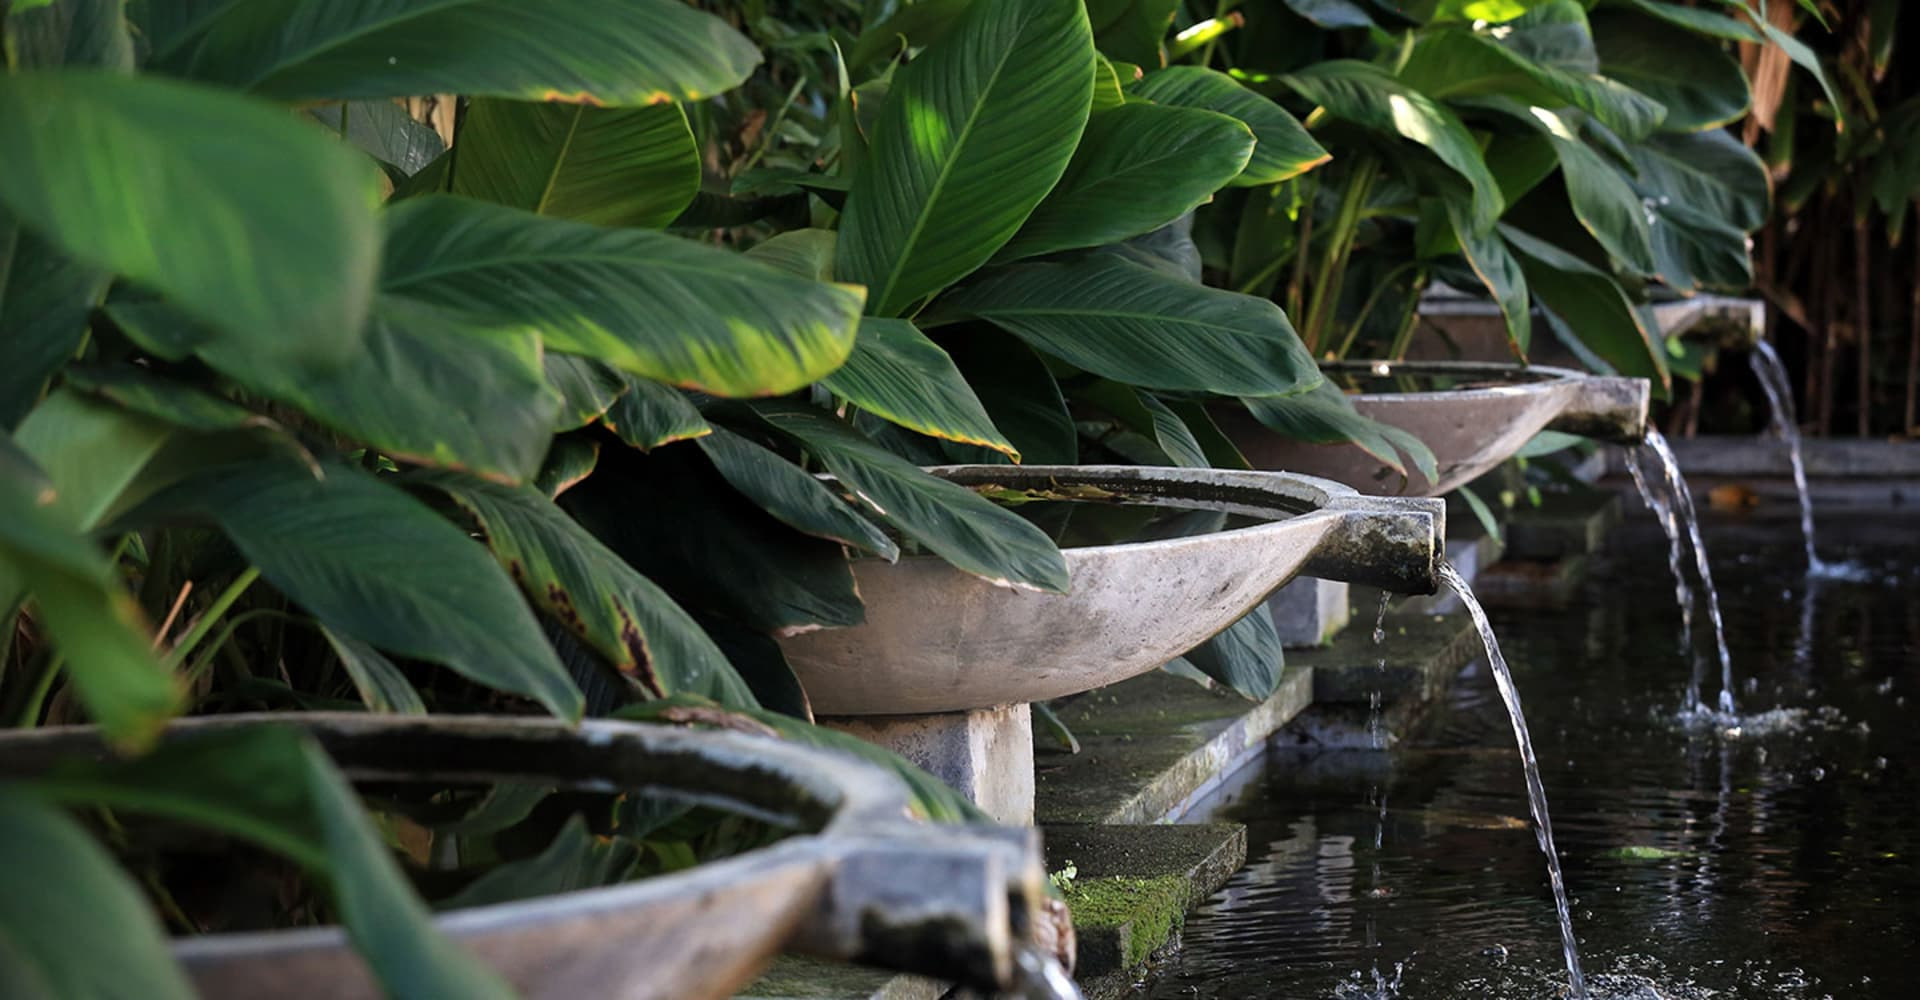 TRAVEL AGENTS HUB - The Pavilions Phuket